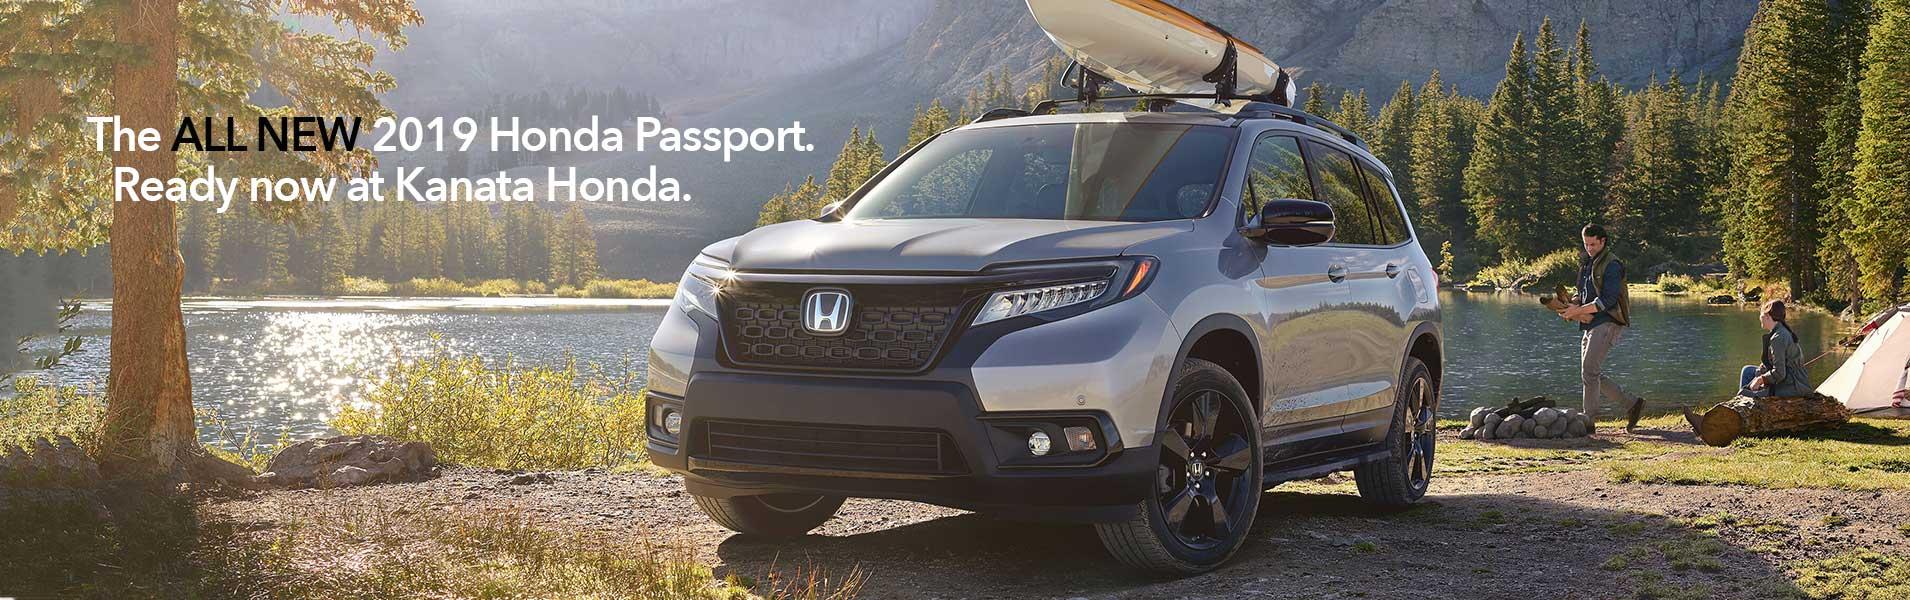 Honda Passport at Kanata Honda.